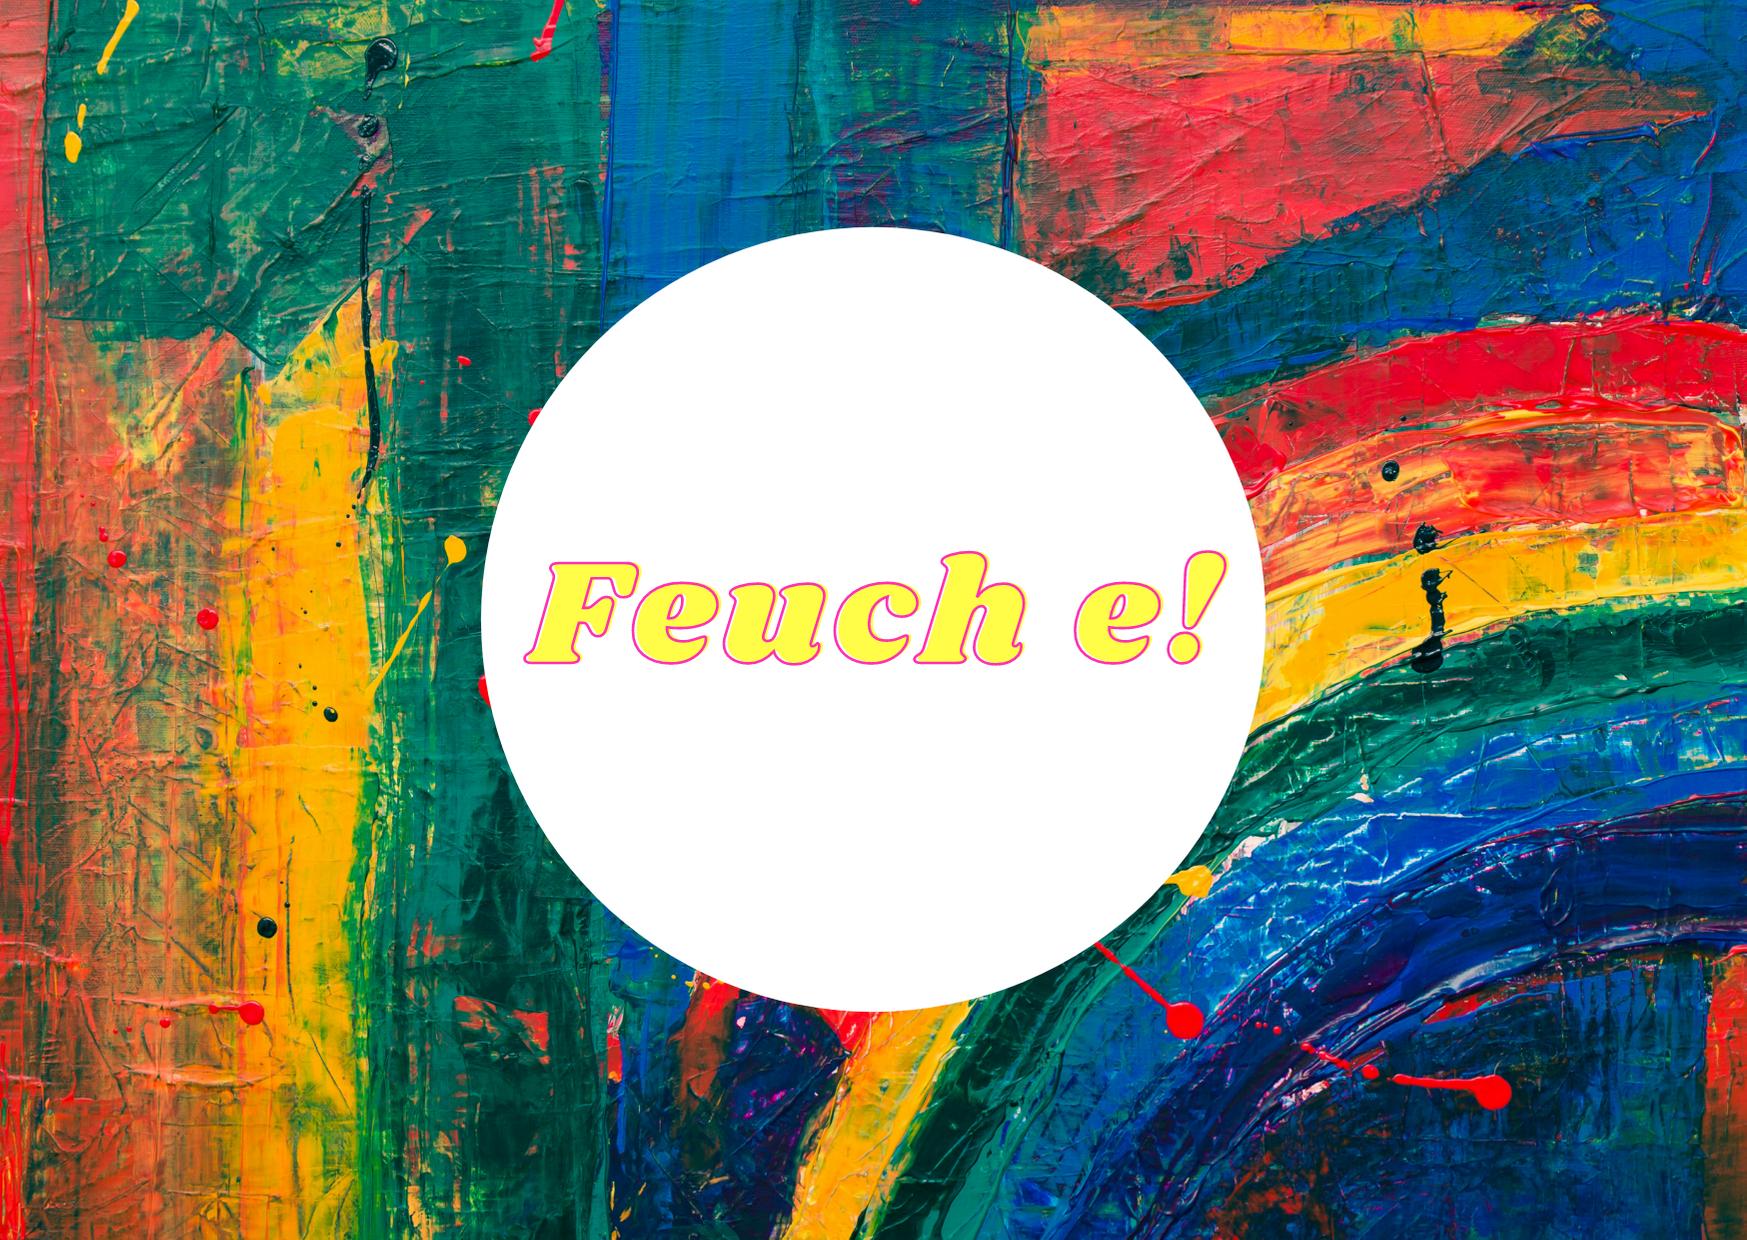 Feuch e! Gaelic Taster Course